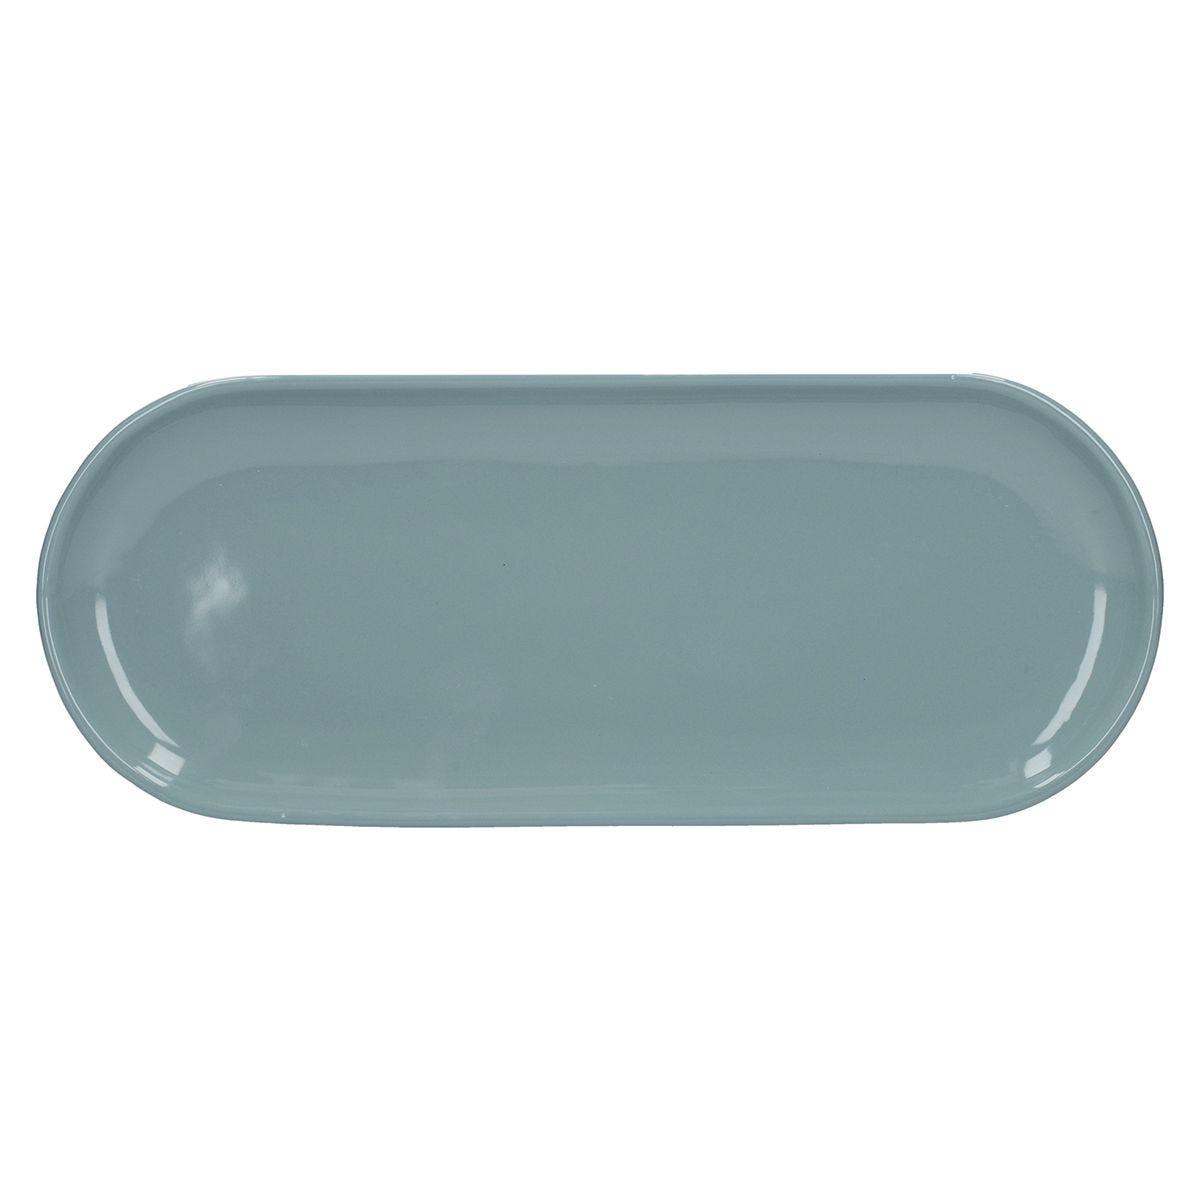 La Cafetiere Ceramic Barcelona Serving Tray - Retro Blue